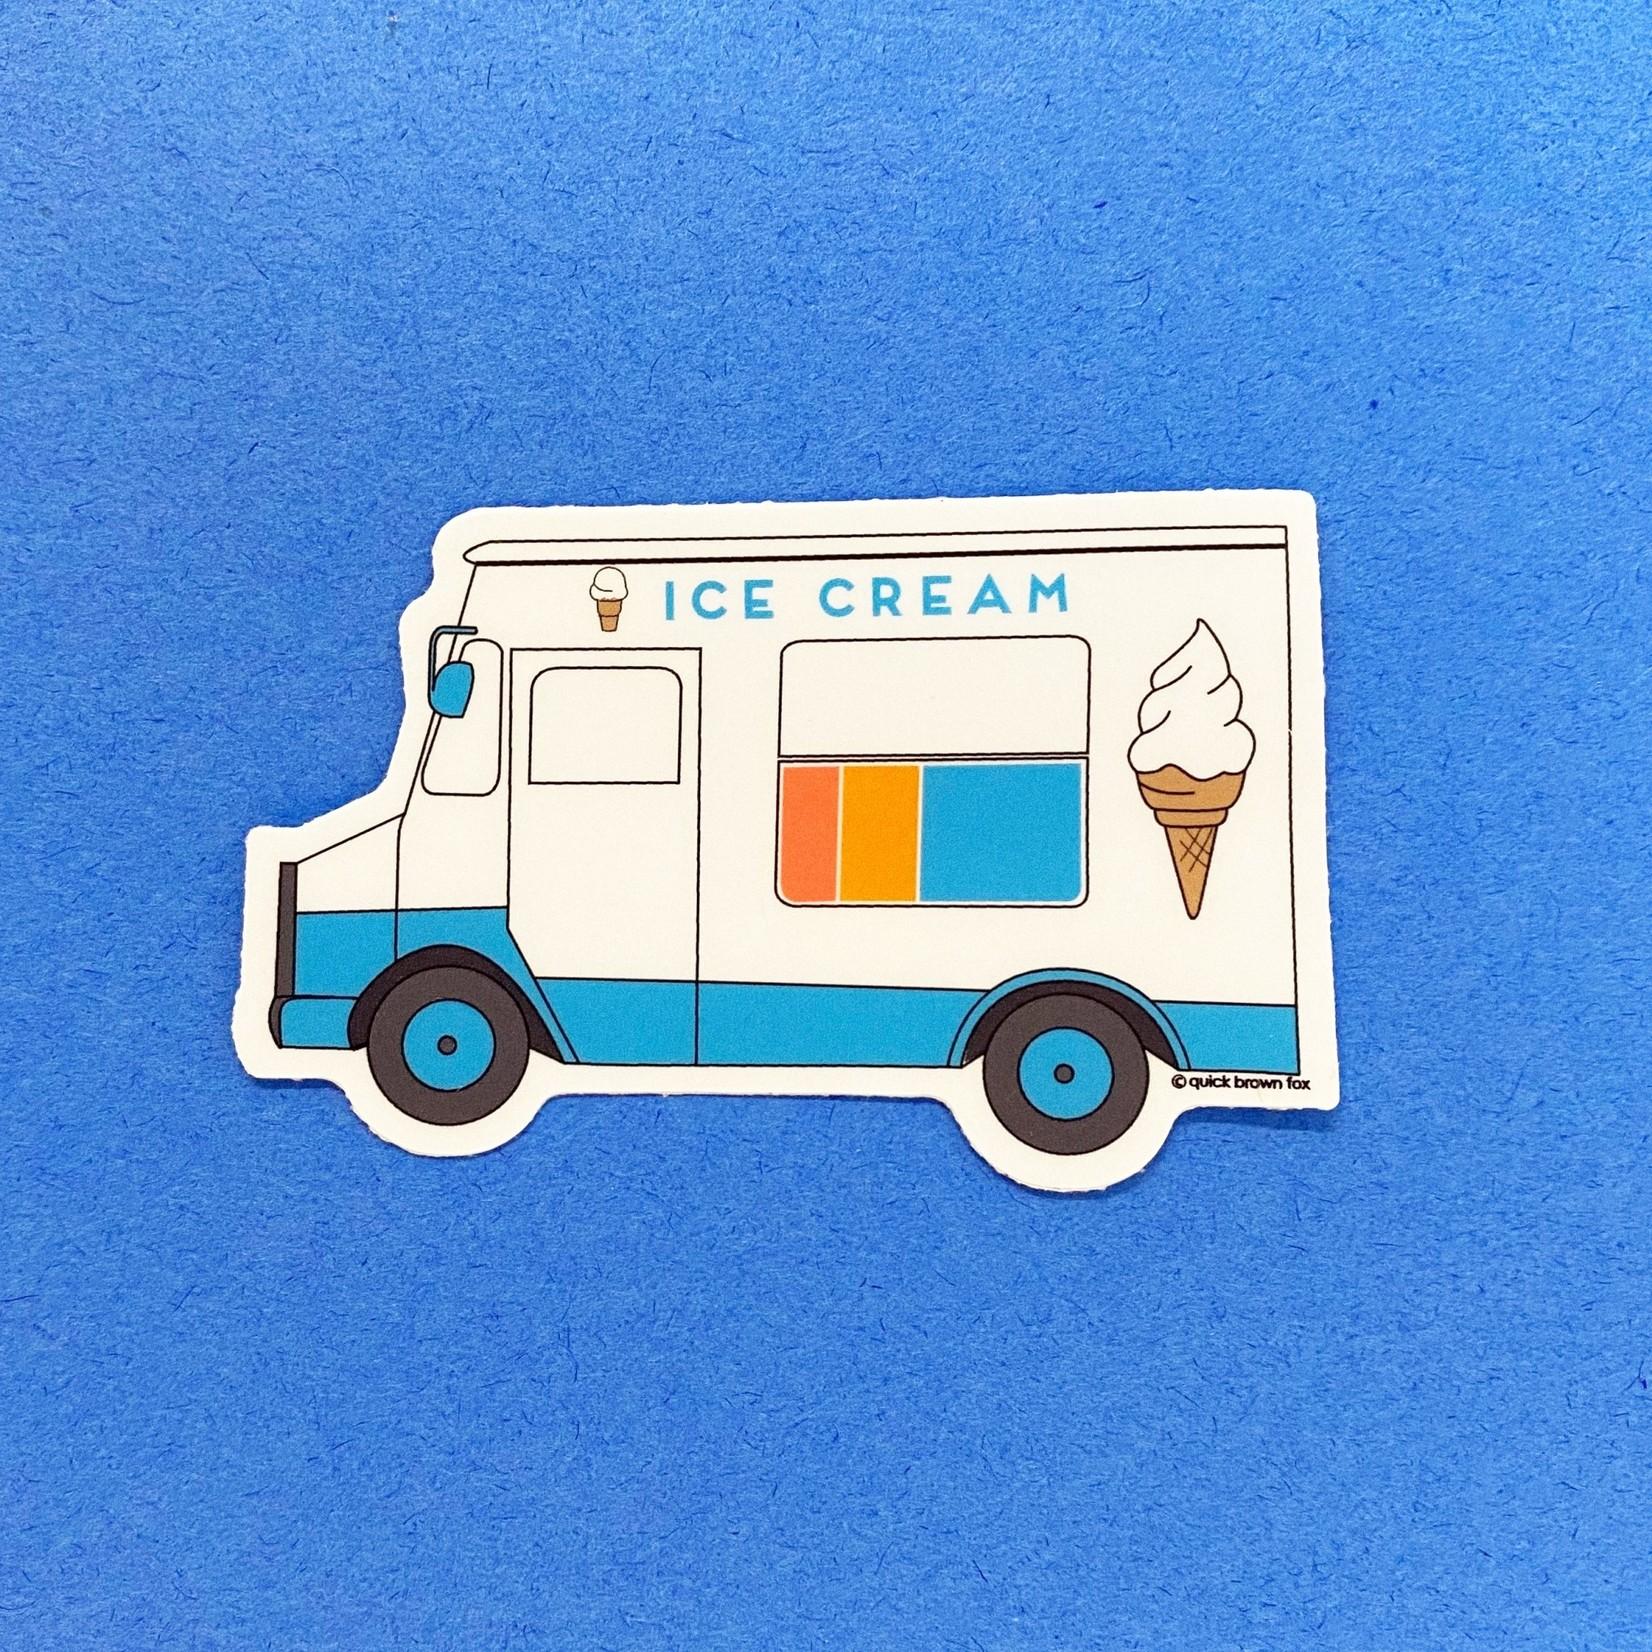 Quick Brown Fox Quick Brown Fox Ice Cream Truck Sticker